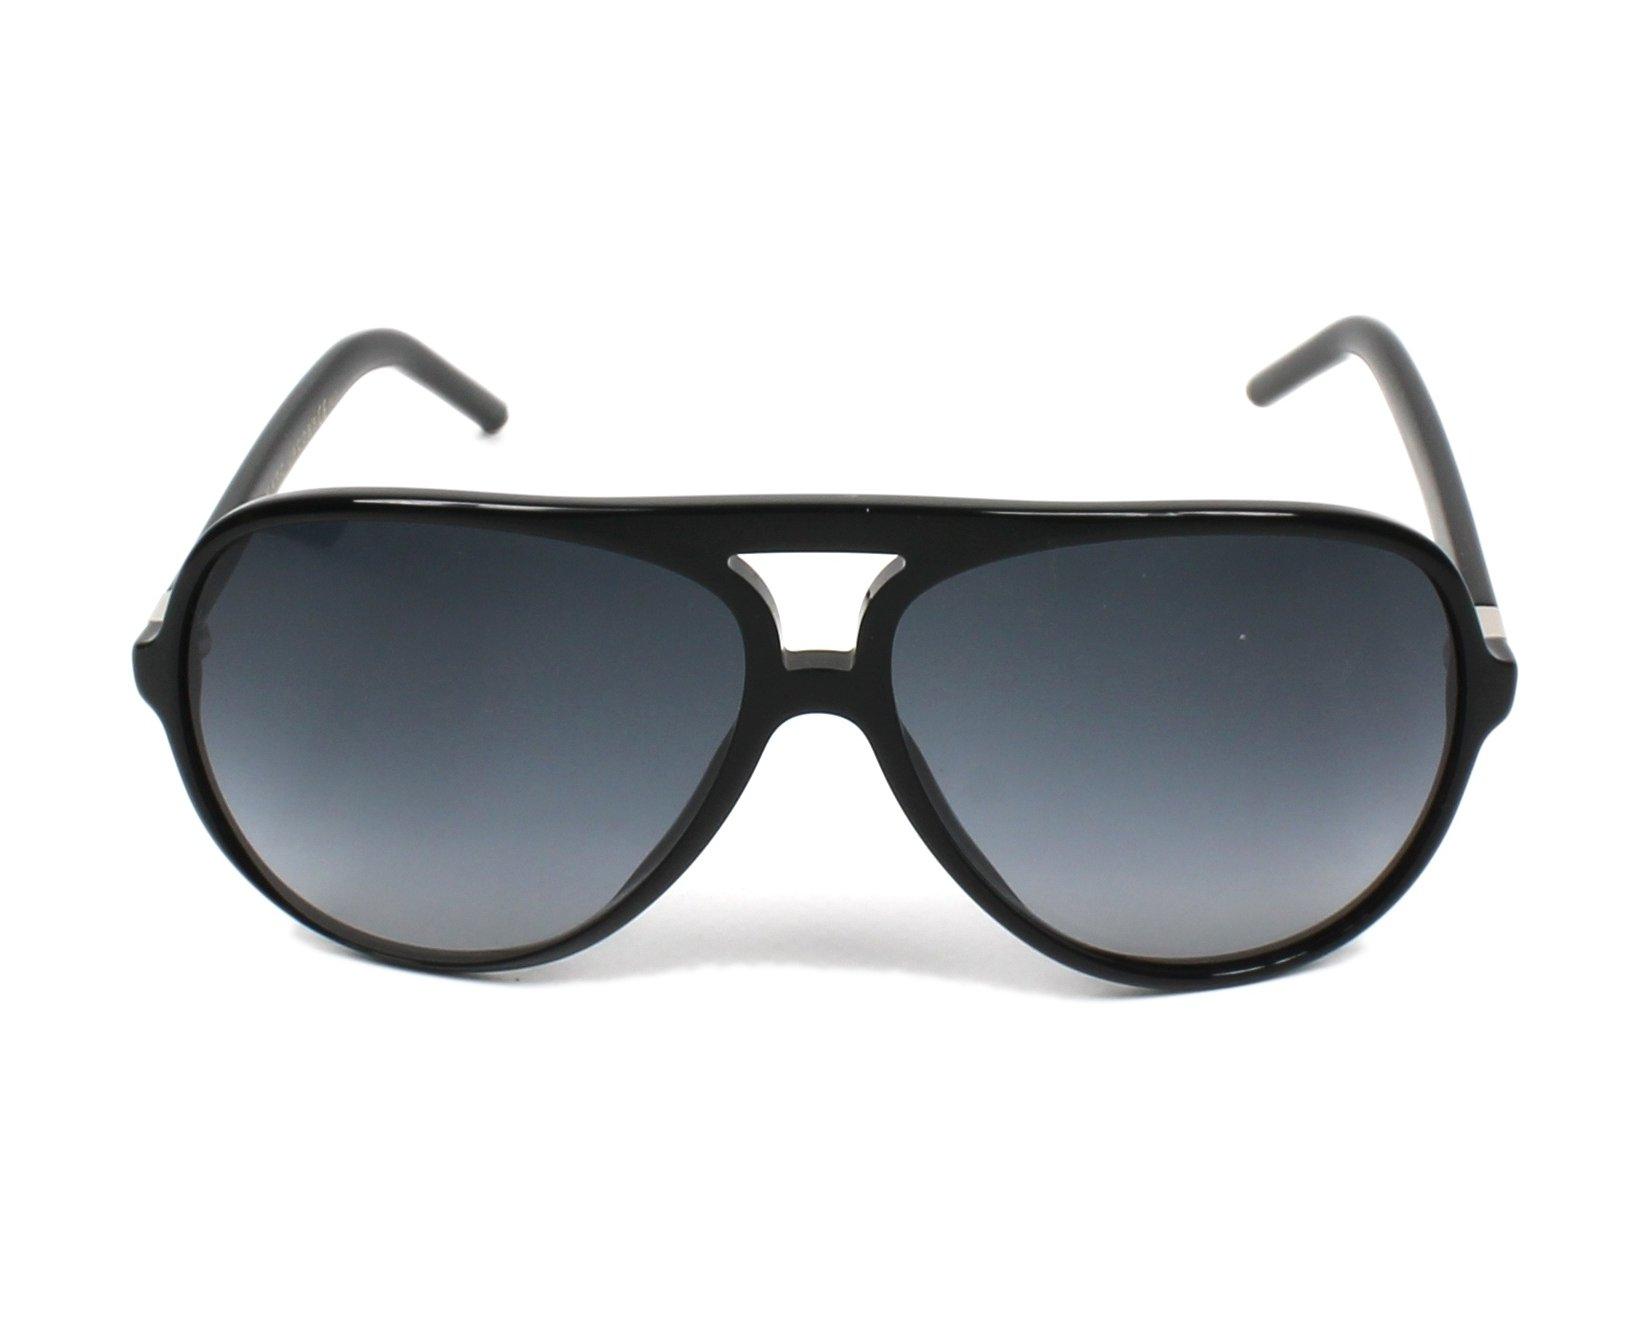 0f8f6a2a20332 Sunglasses Marc Jacobs MARC-70-S 807 HD 60-13 Black front